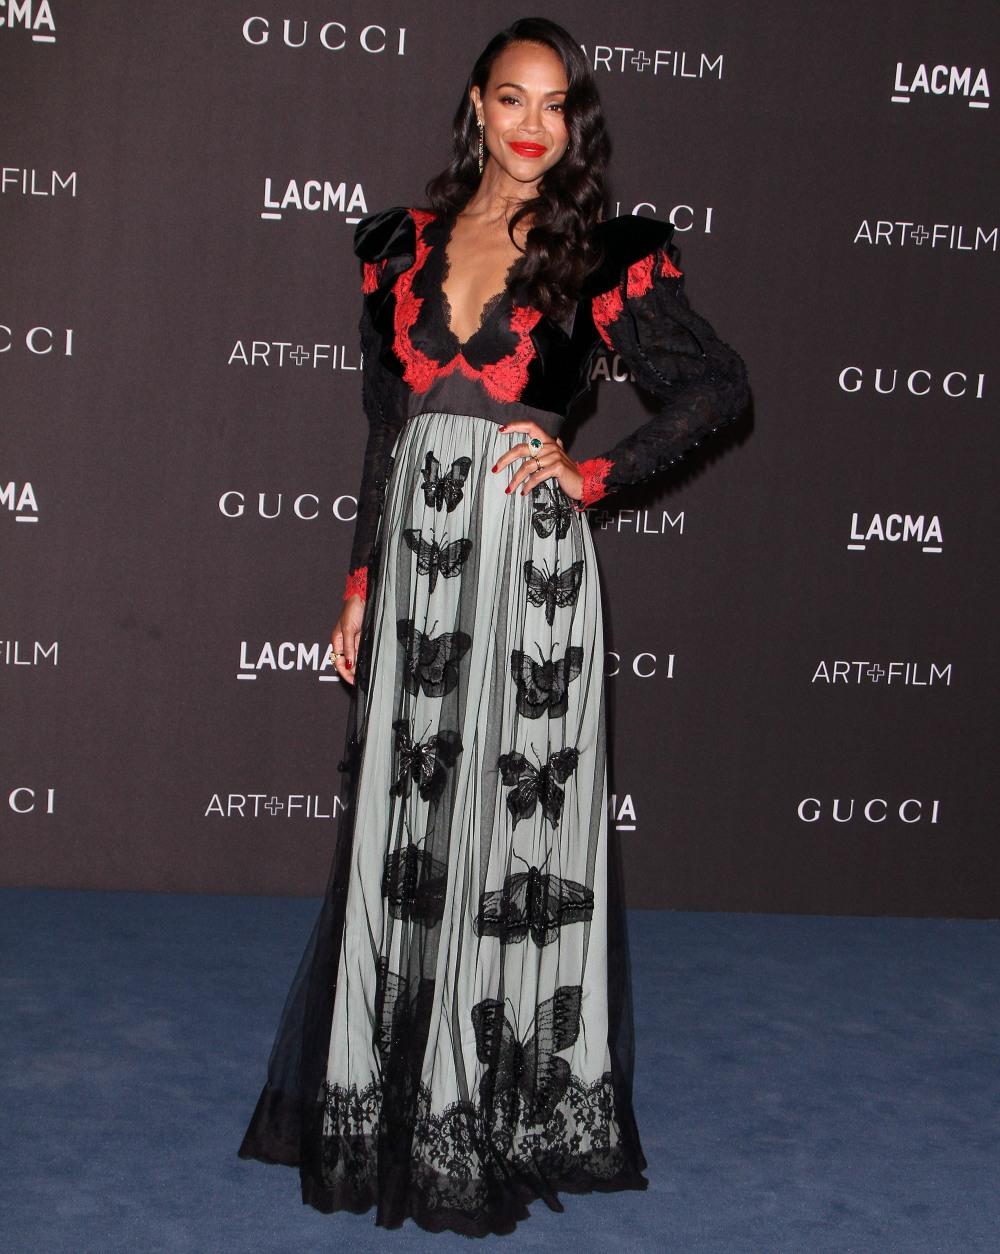 Zoe Saldana attends  the 2019 LACMA ART +FILM GALA in Los Angeles